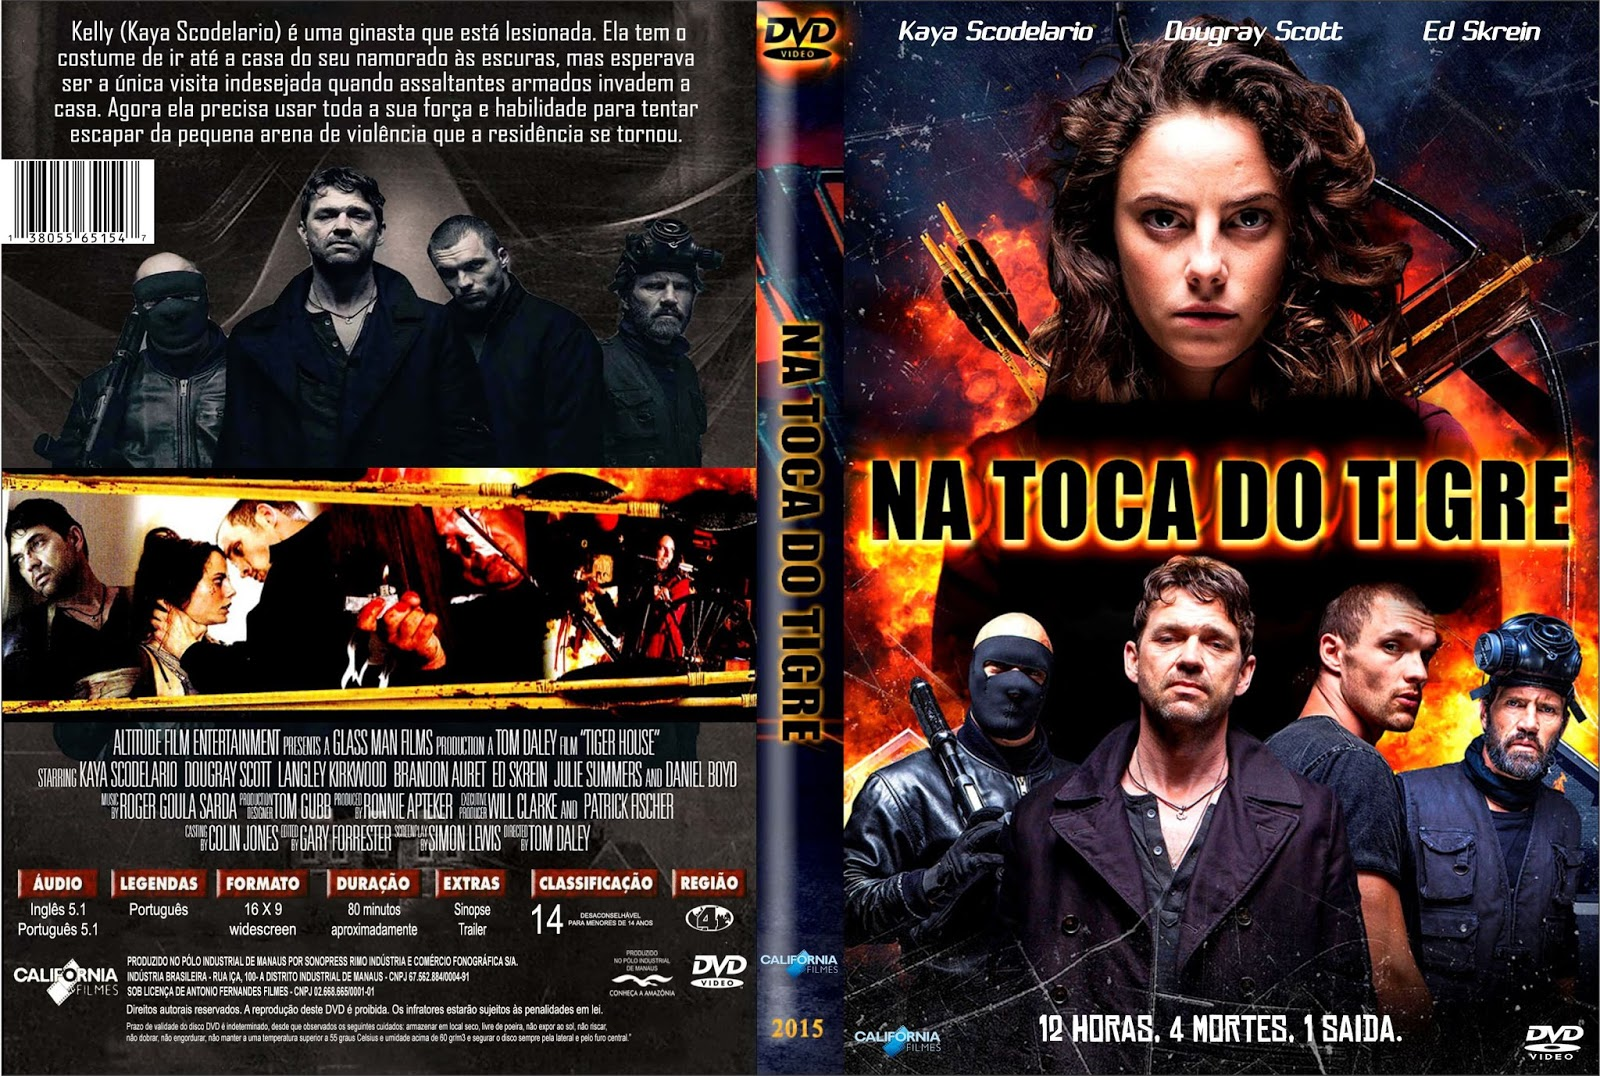 Download Na Toca do Tigre DVD-R Na 2BToca 2Bdo 2BTigre 2BDVD R 2BXANDAODOWNLOAD